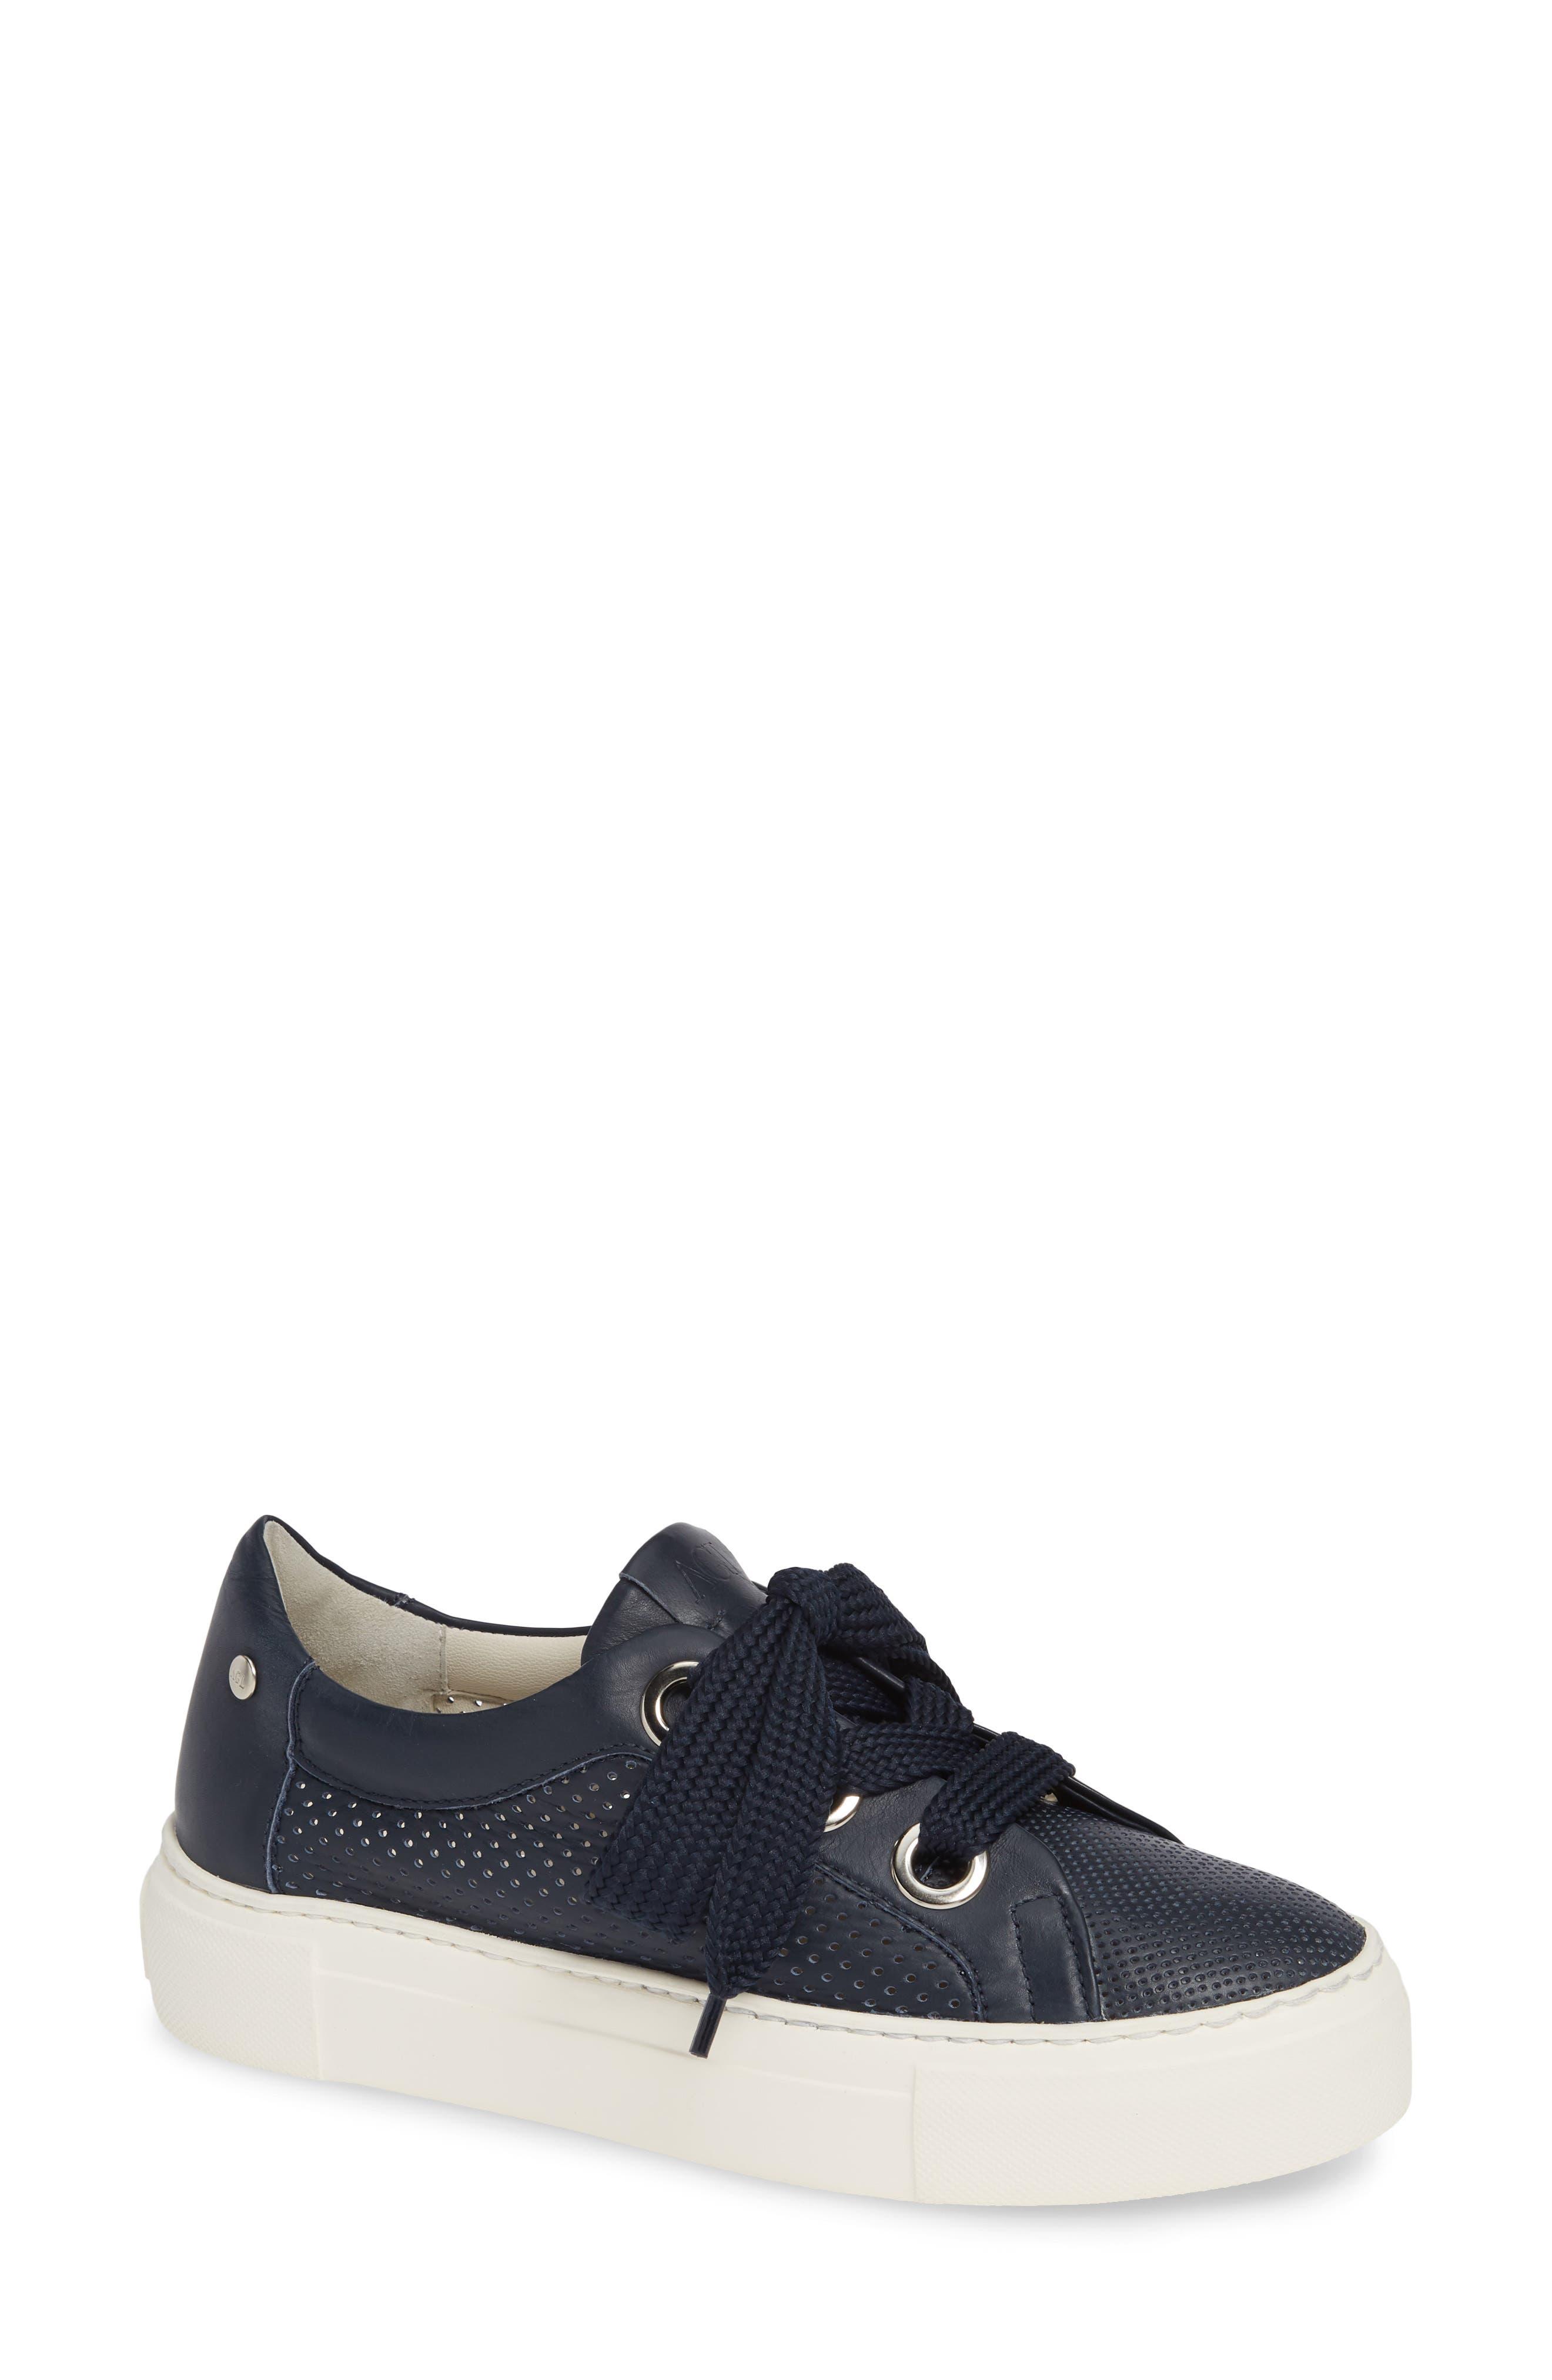 Agl Perforated Platform Sneaker